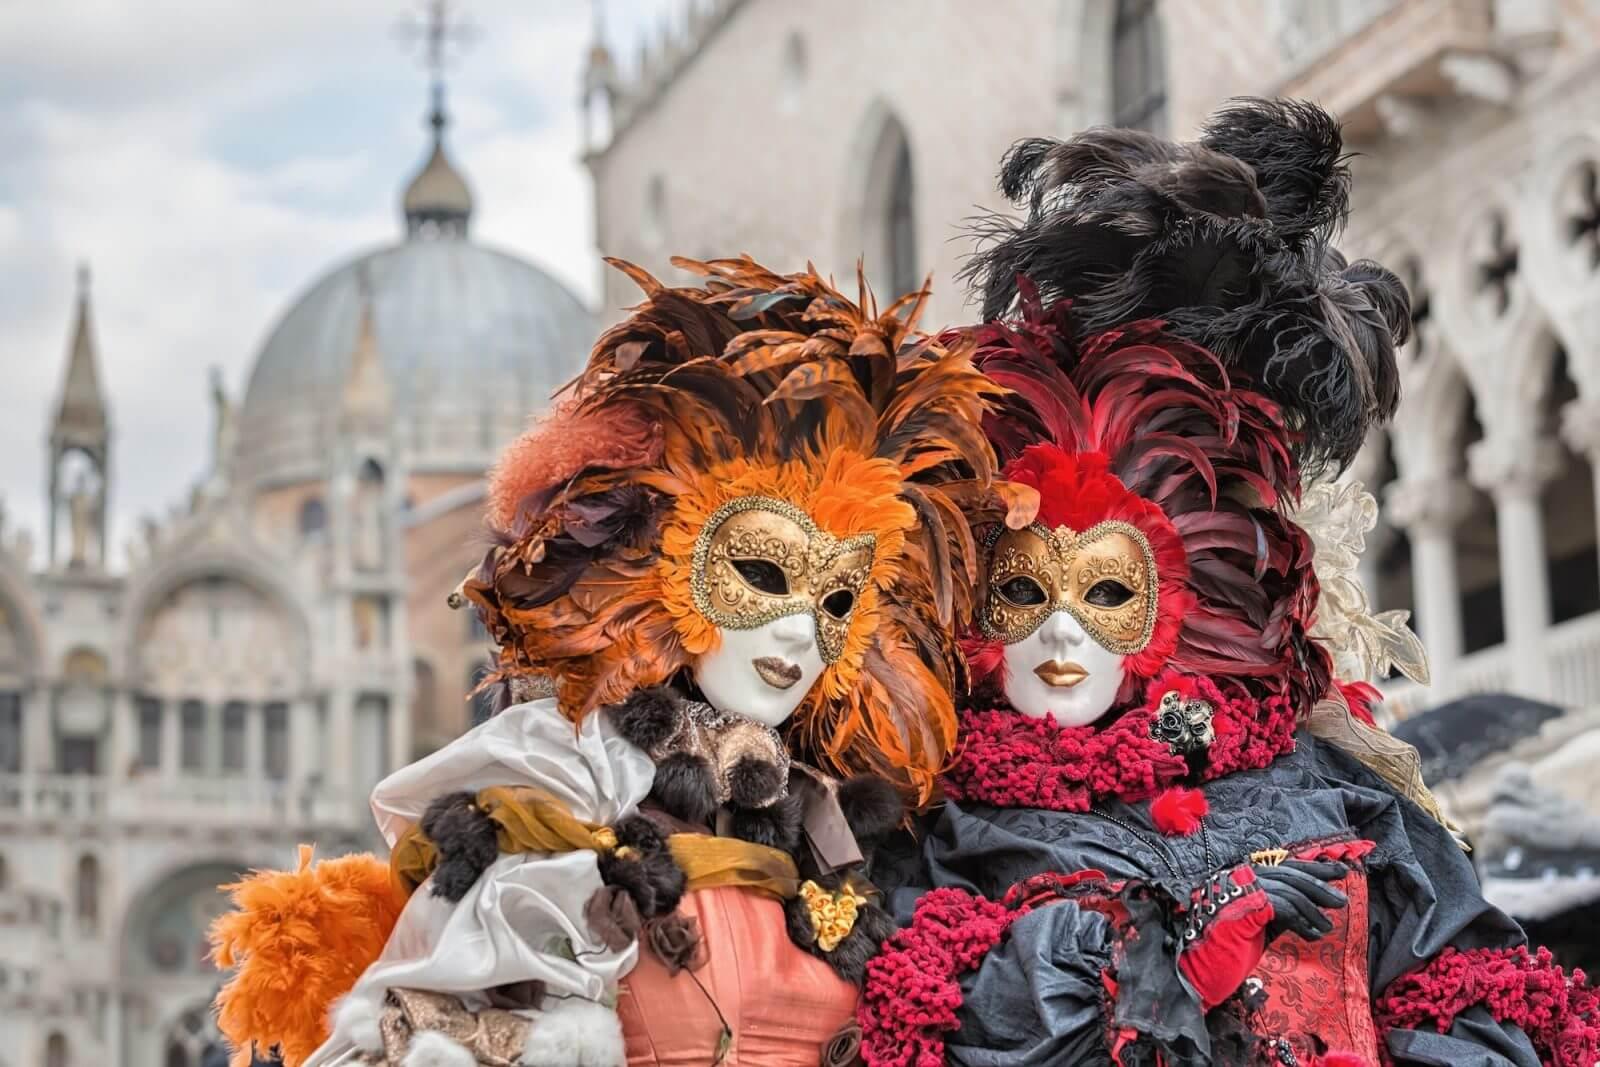 Carnaval, Carnaval ... Carnaval te quiero